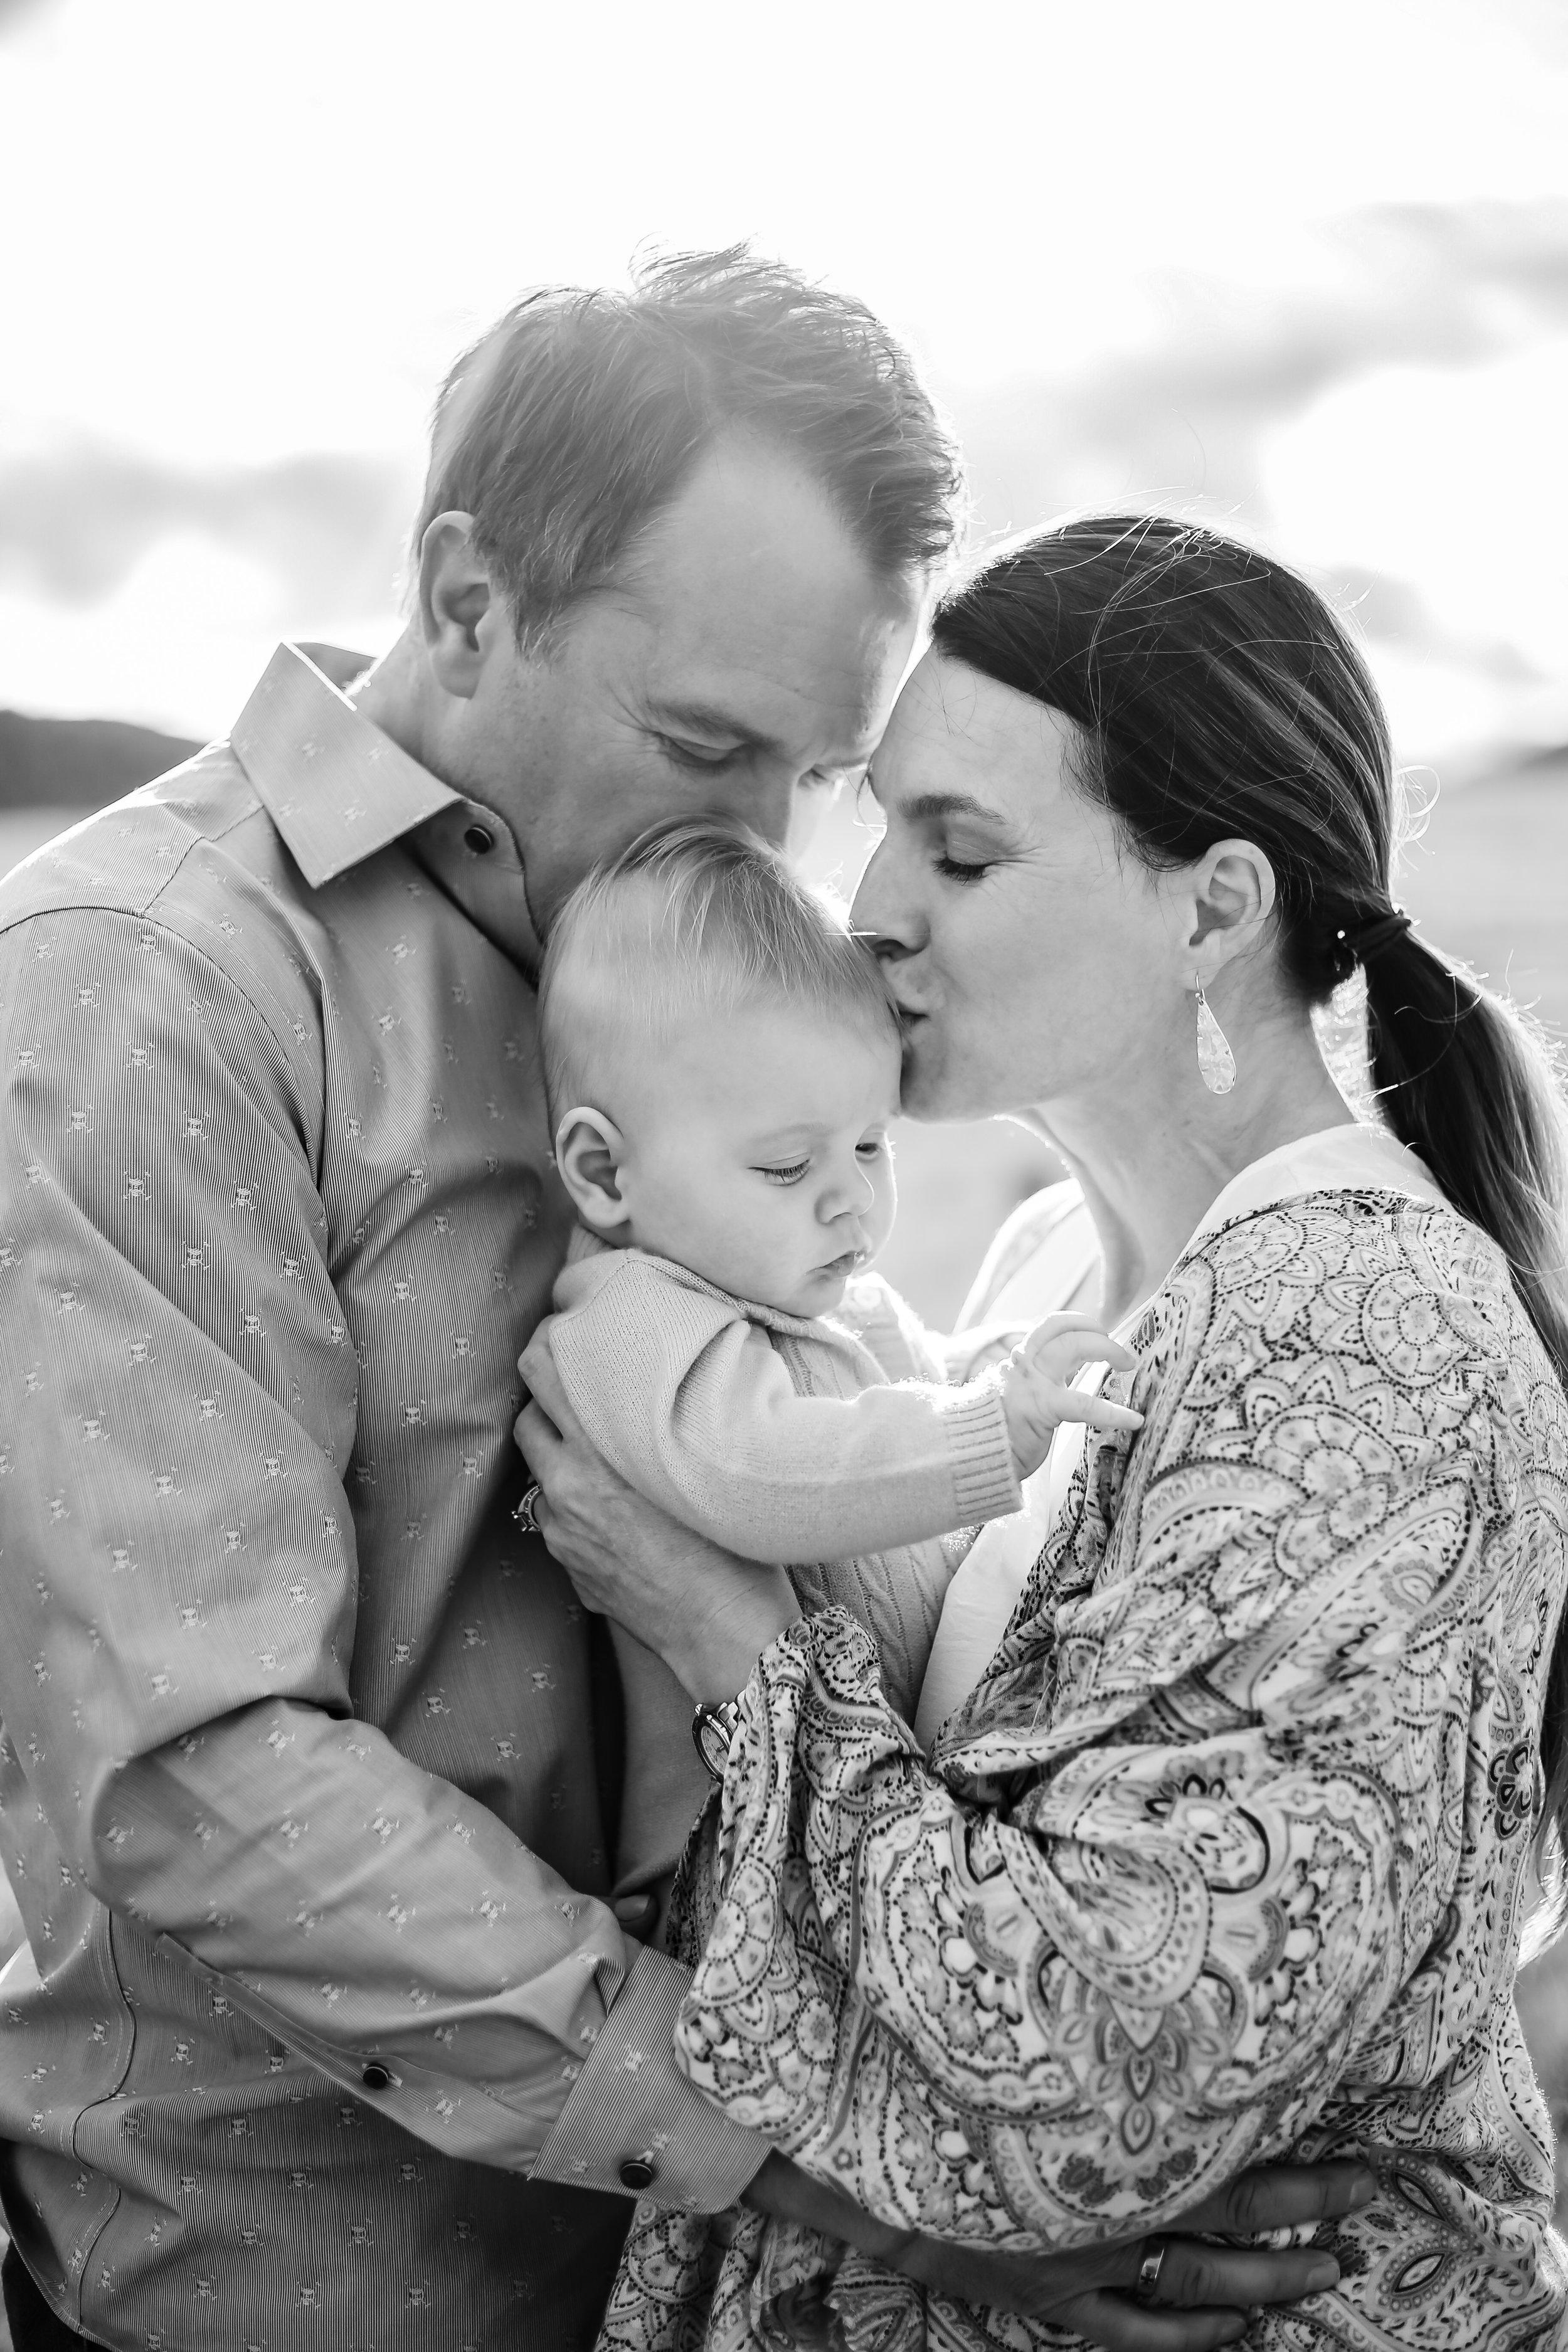 missoula-family-photographer-apaytonphoto-27.jpg